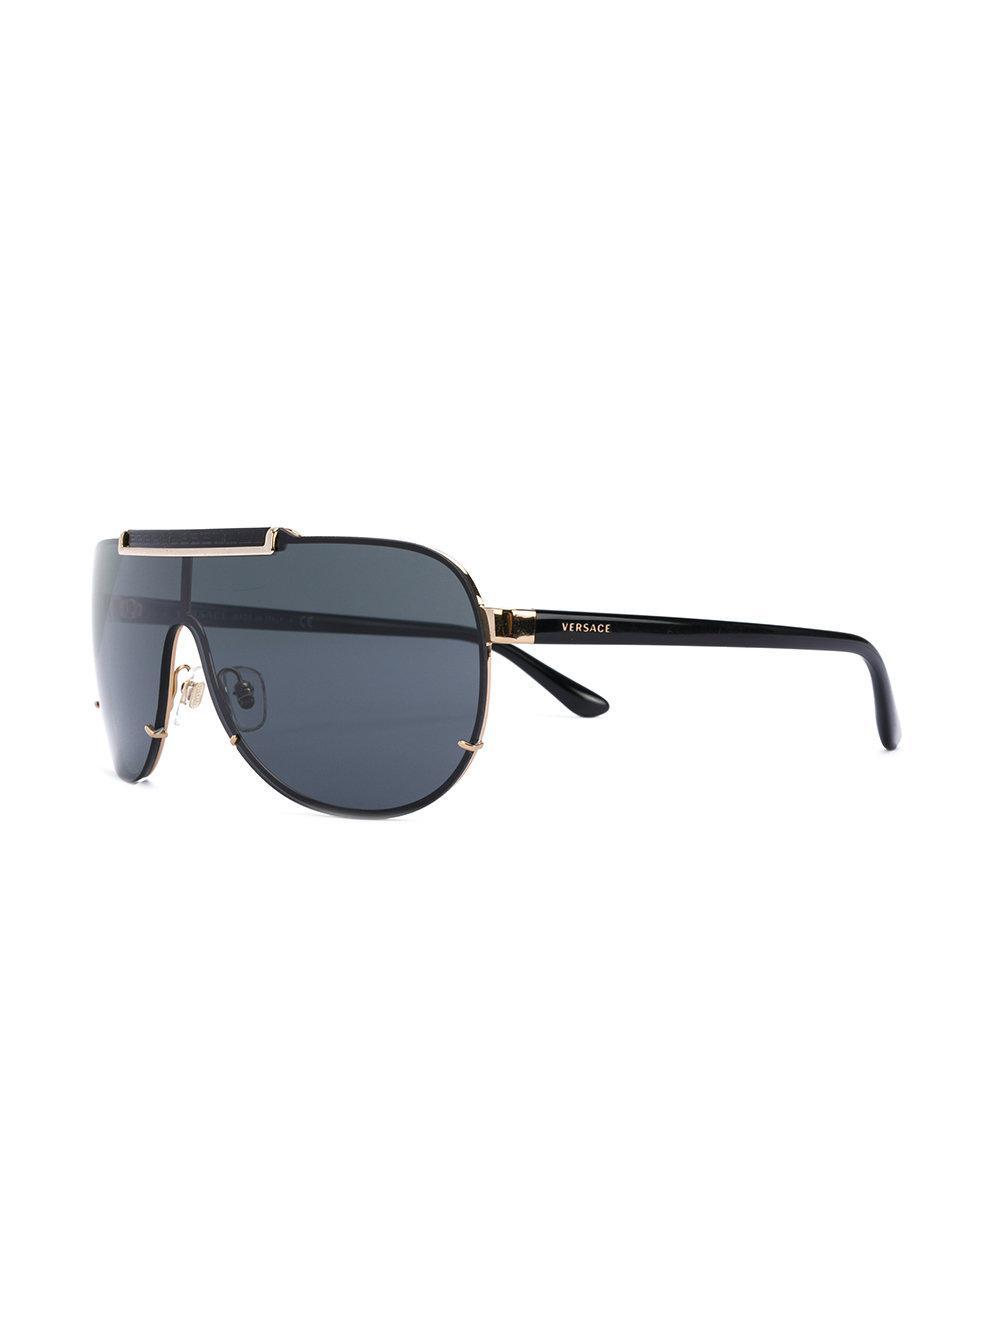 810e2cc73b97 Lyst - Versace Visor Aviator Sunglasses in Black